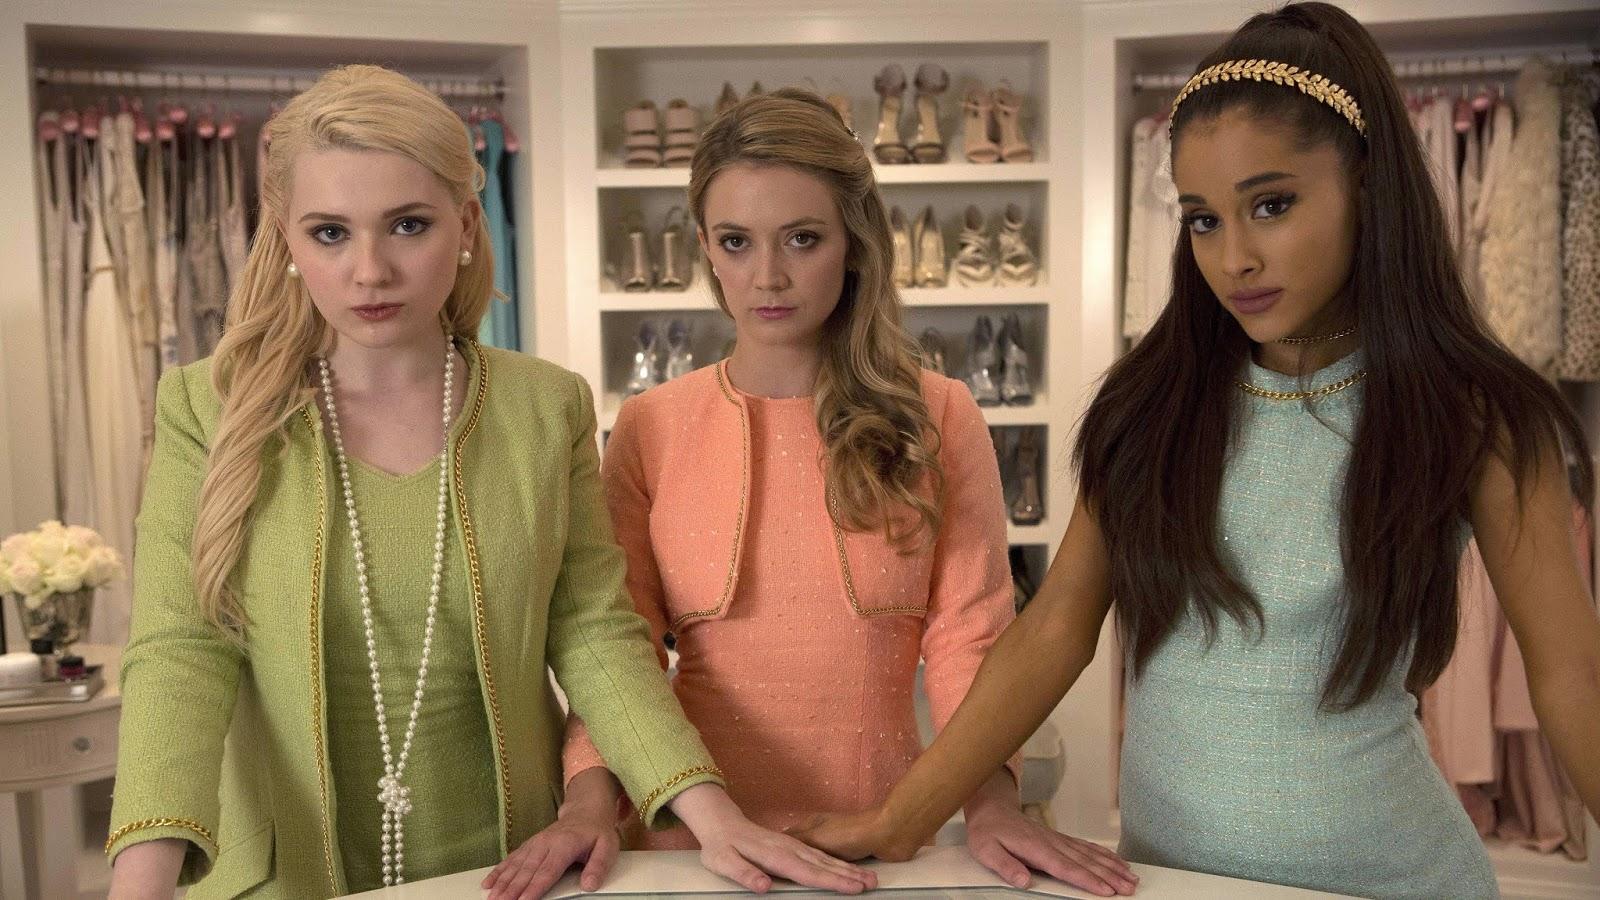 Abigail Breslin, Ariana Grande, Billie Lourd, Scream Queens, 4K, TV Series